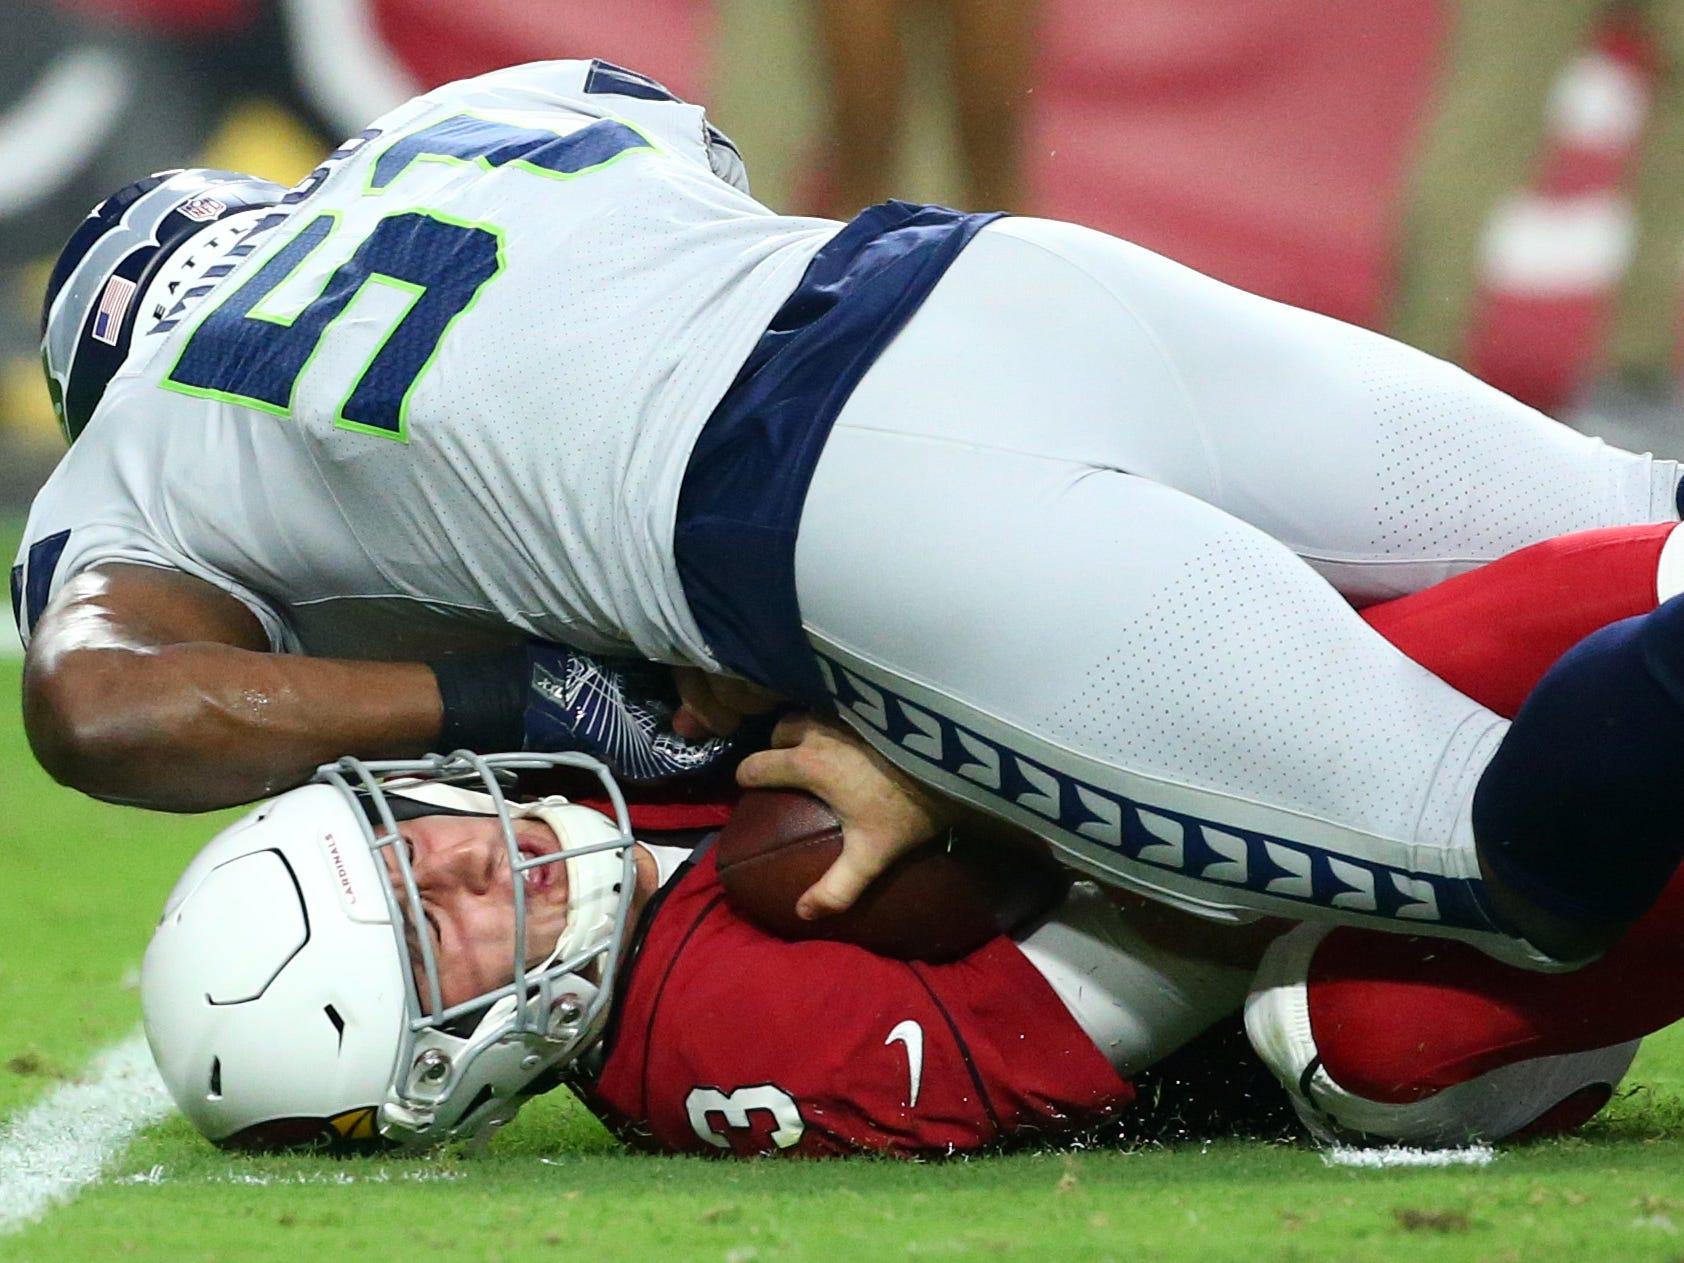 Arizona Cardinals quarterback Josh Rosen is sacked by Seattle Seahawks linebacker Barkevious Mingo in the first half at State Farm Stadium in Glendale, Ariz.